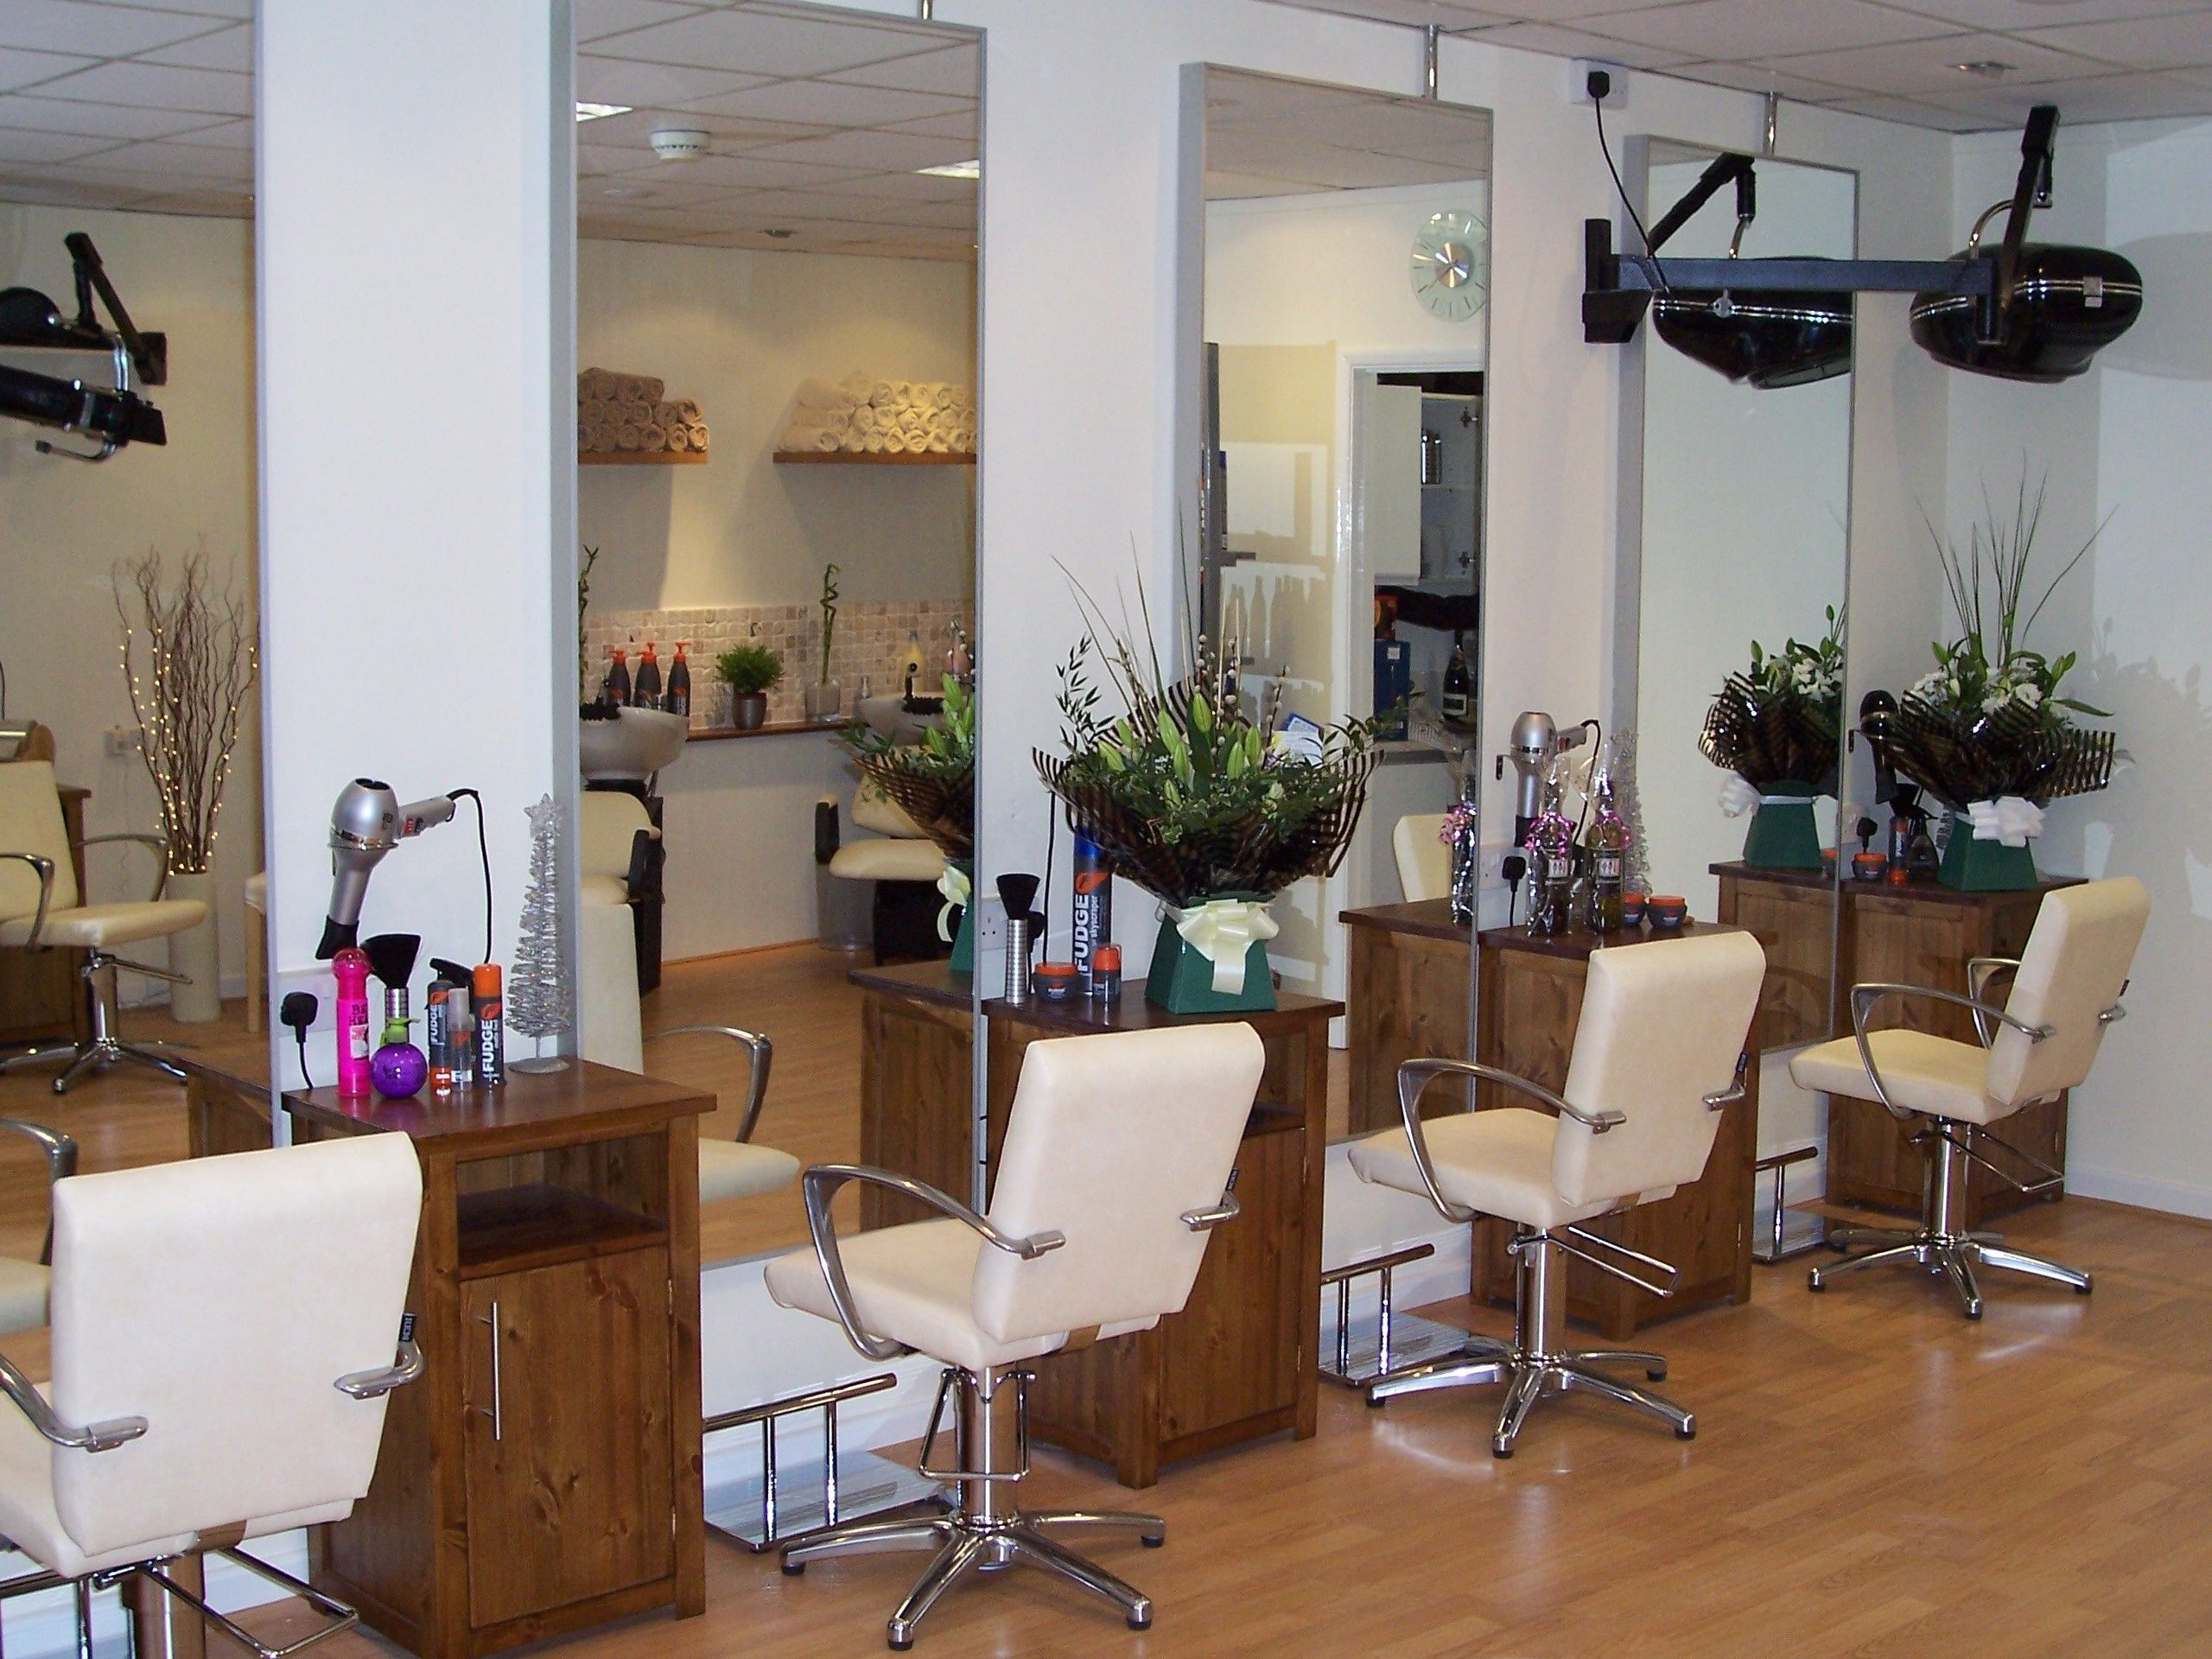 Best Of Hair Salon Makeover-Ideen - Neue Haare Modelle  Home